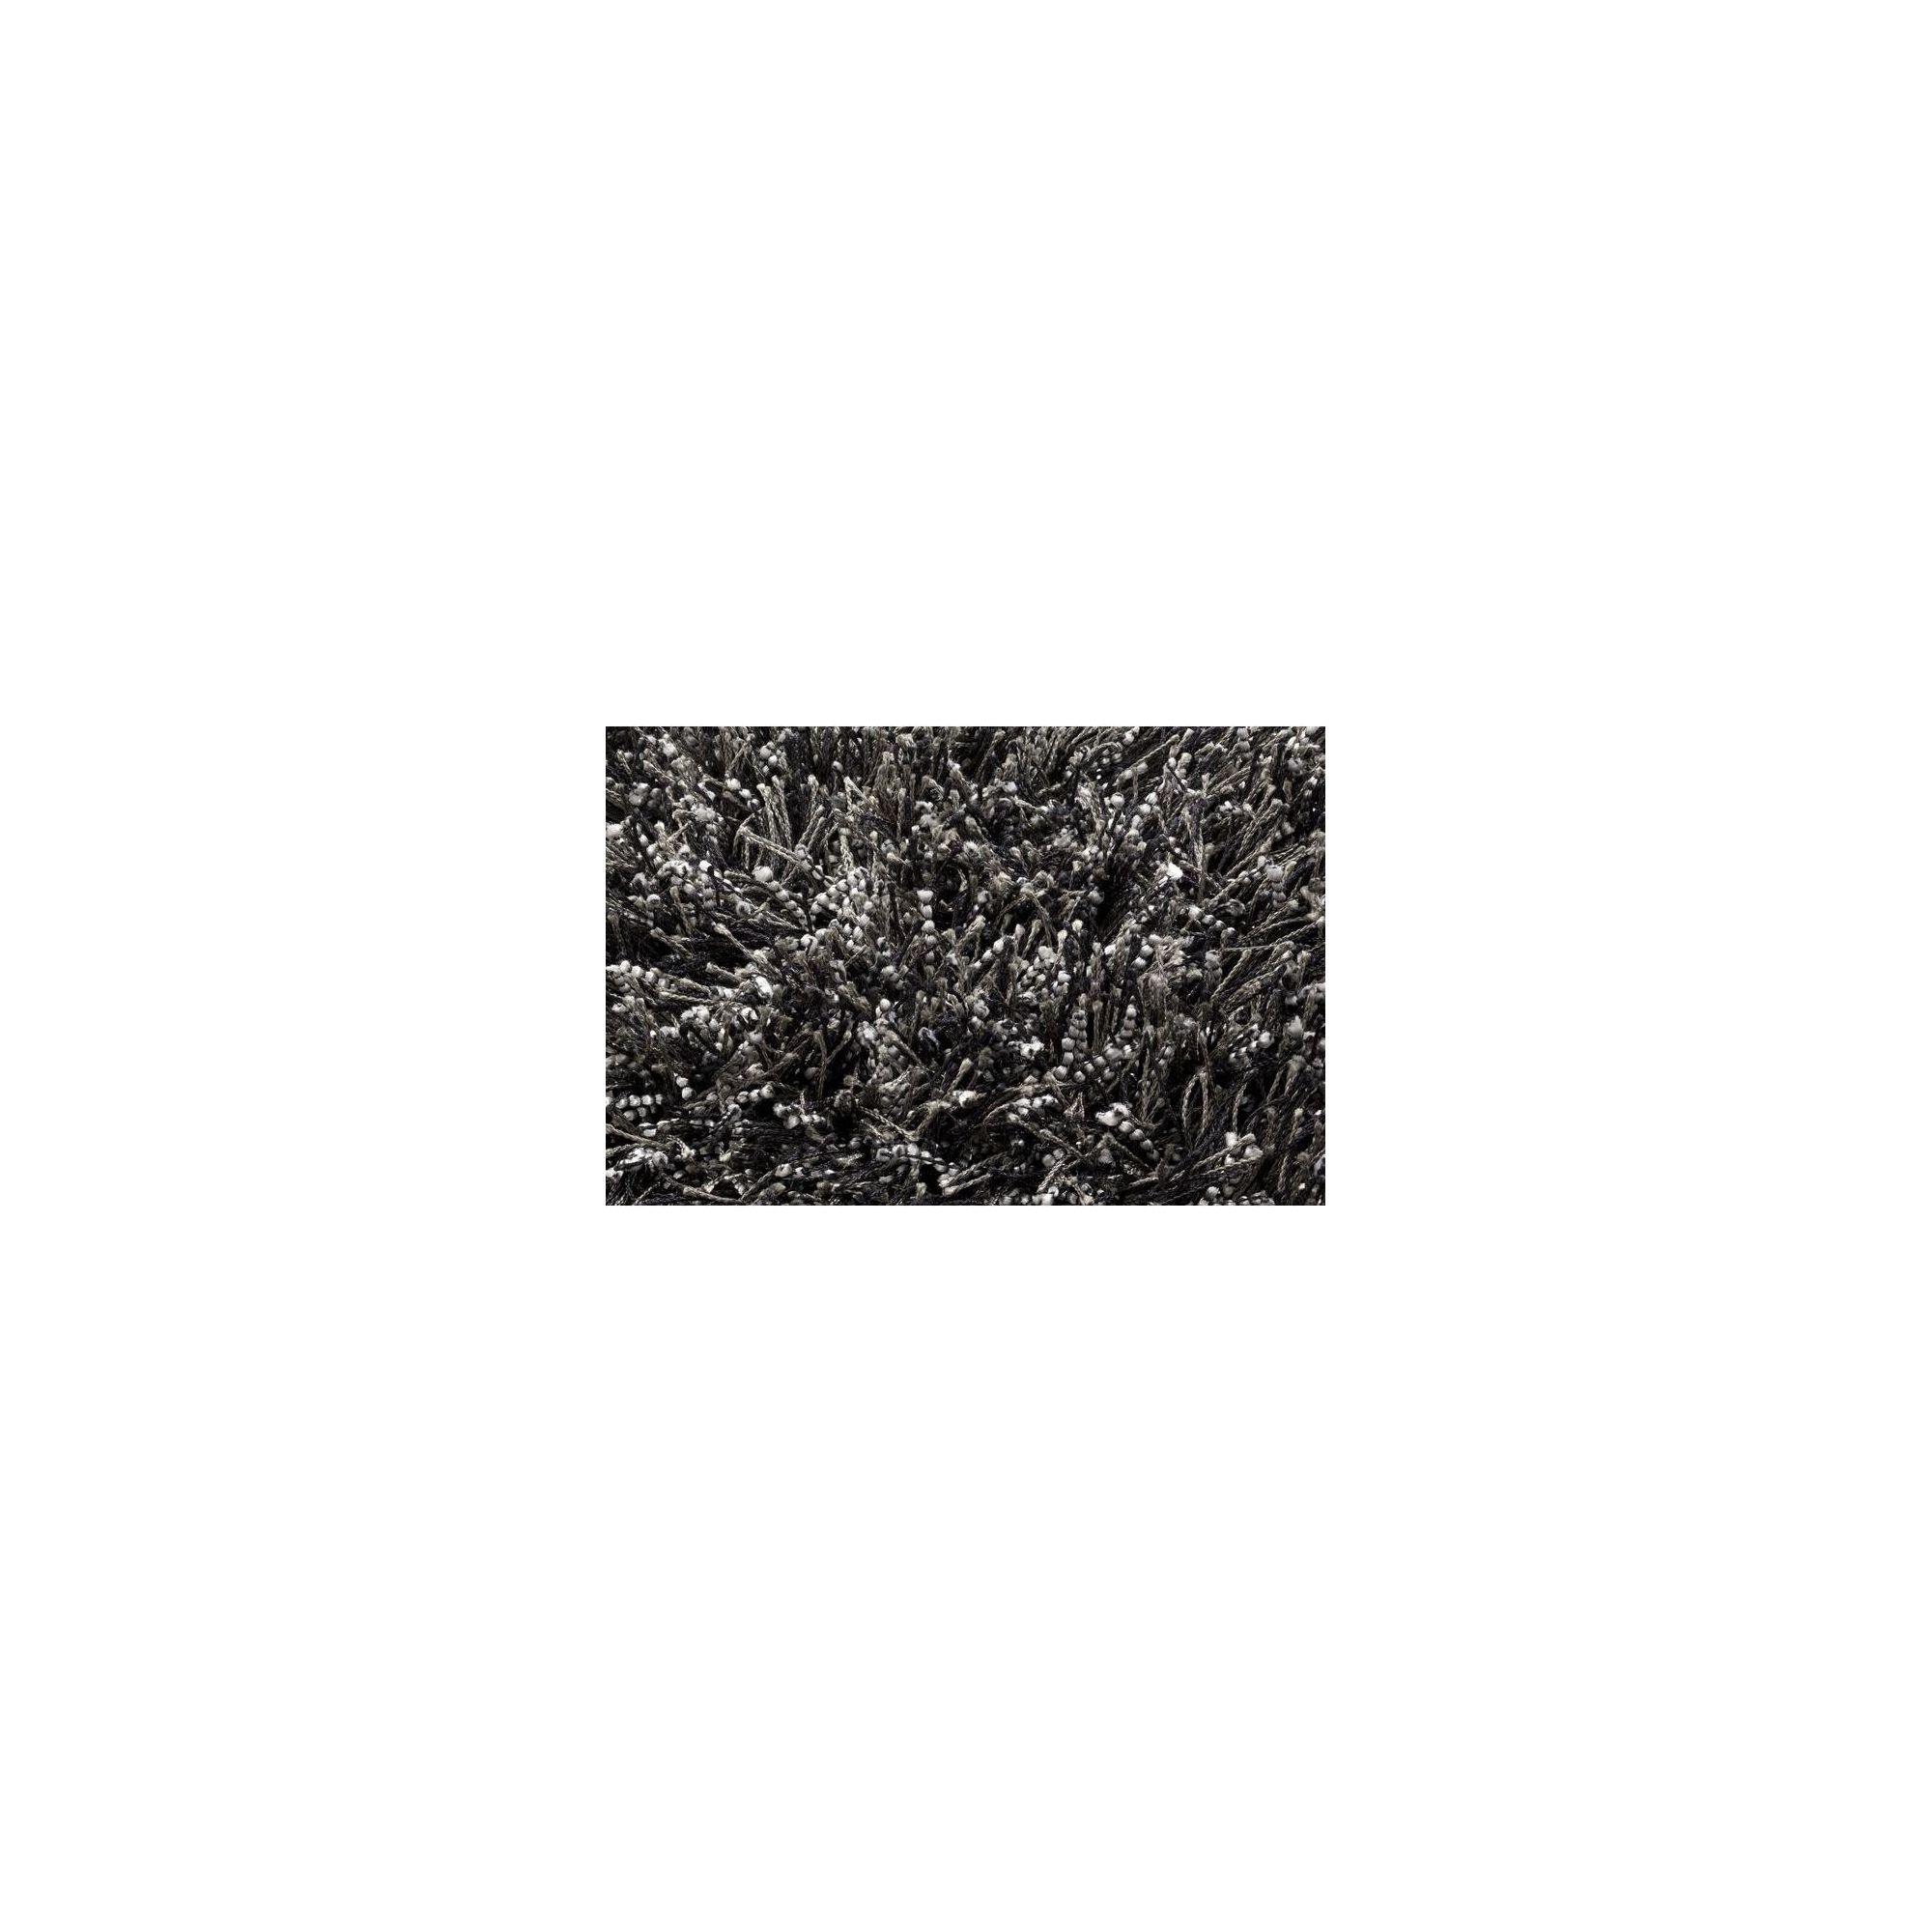 Linie Design Sprinkle Black Shag Rug - 230cm x 160cm at Tesco Direct